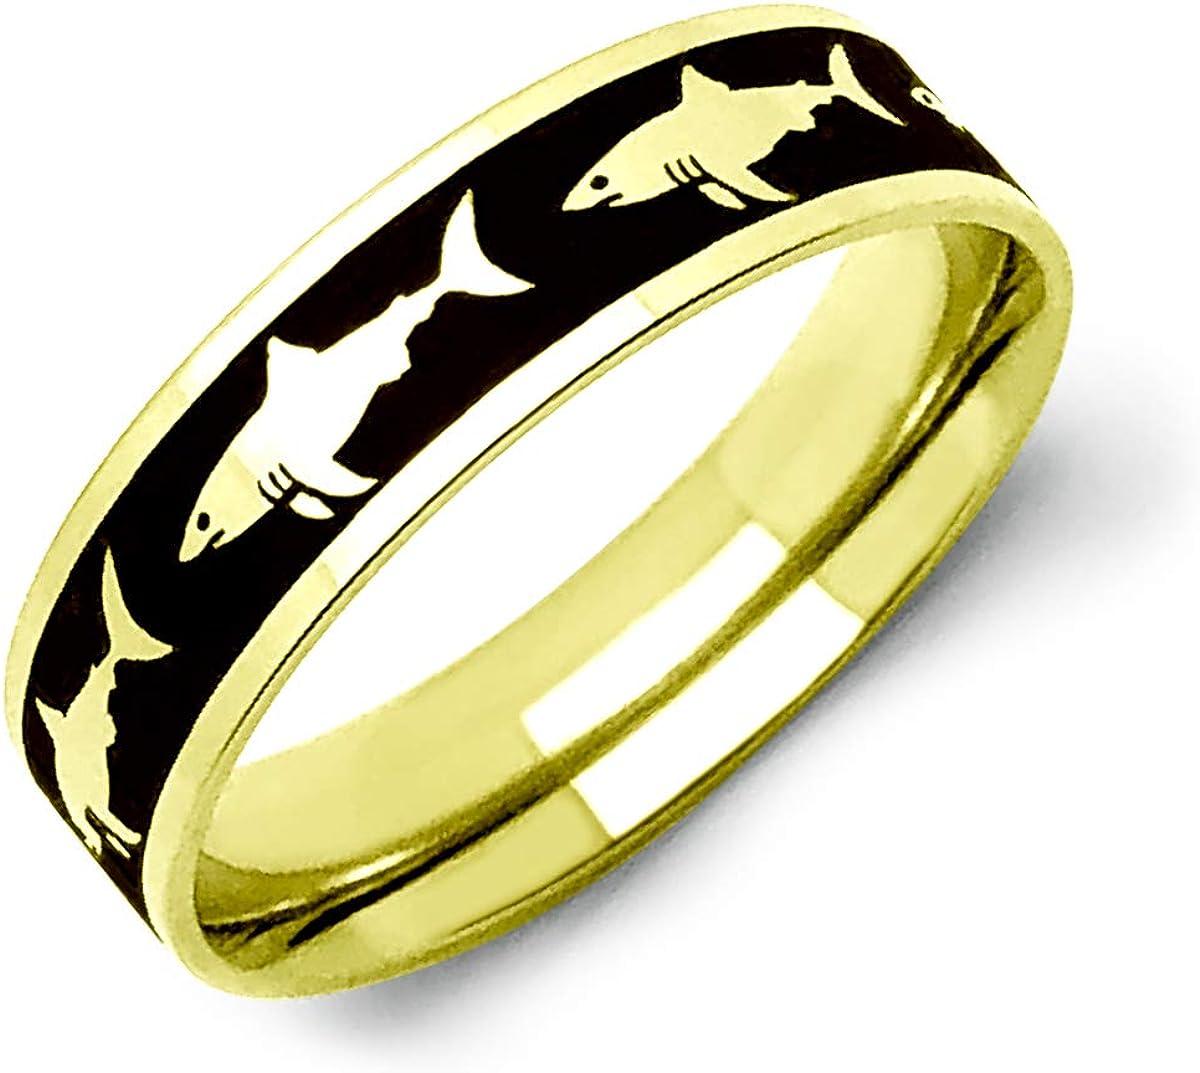 Kriskate & Co. Shark Ring Personalized Stainless Steel Ring Gold Tone Wedding Band for Men or Women Promise Ring SSR780-G